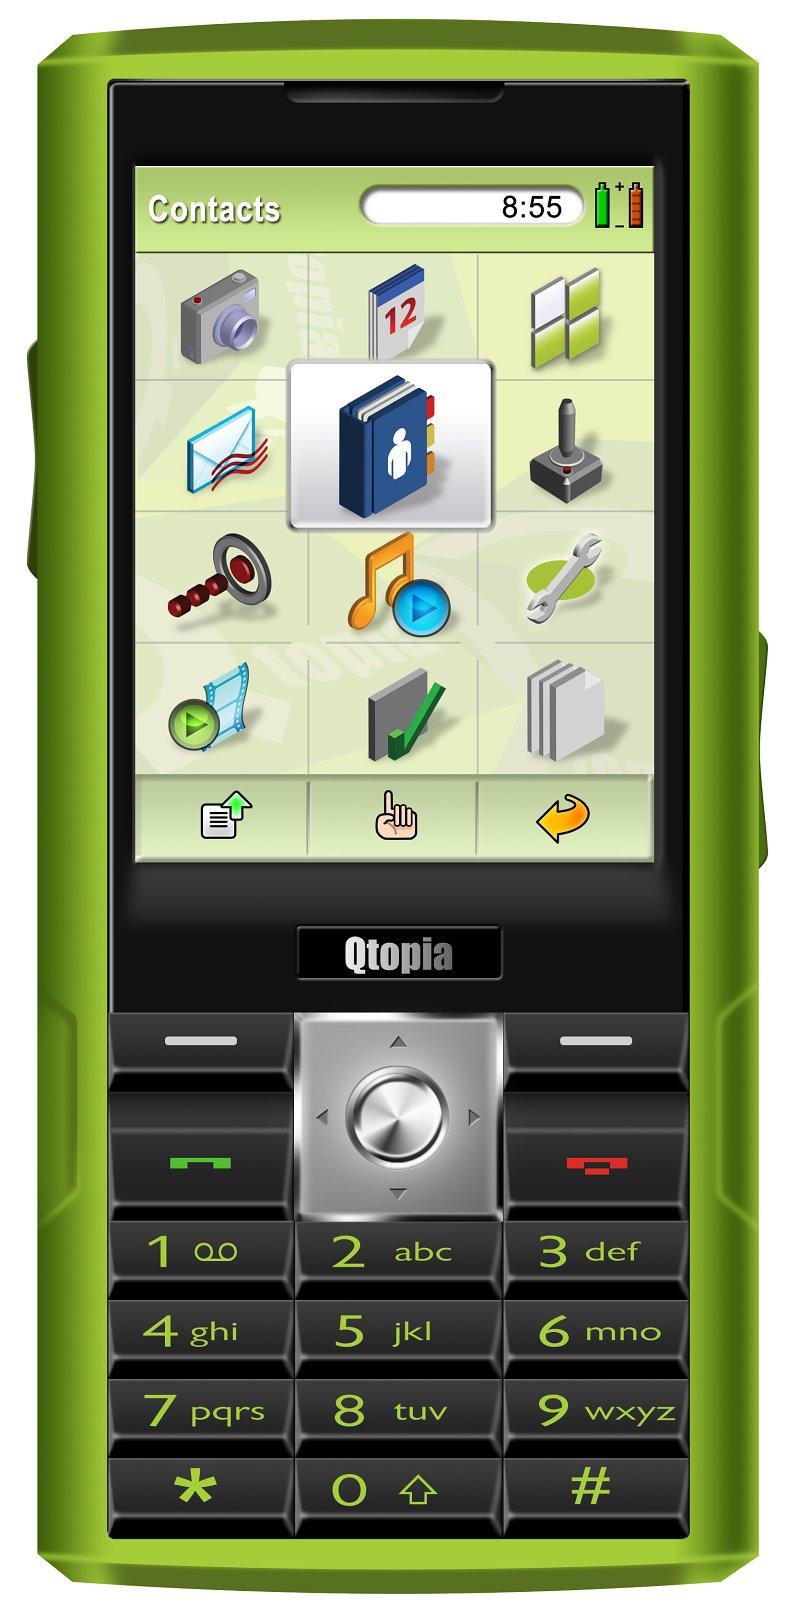 Trolltech stellt Greenphone ein